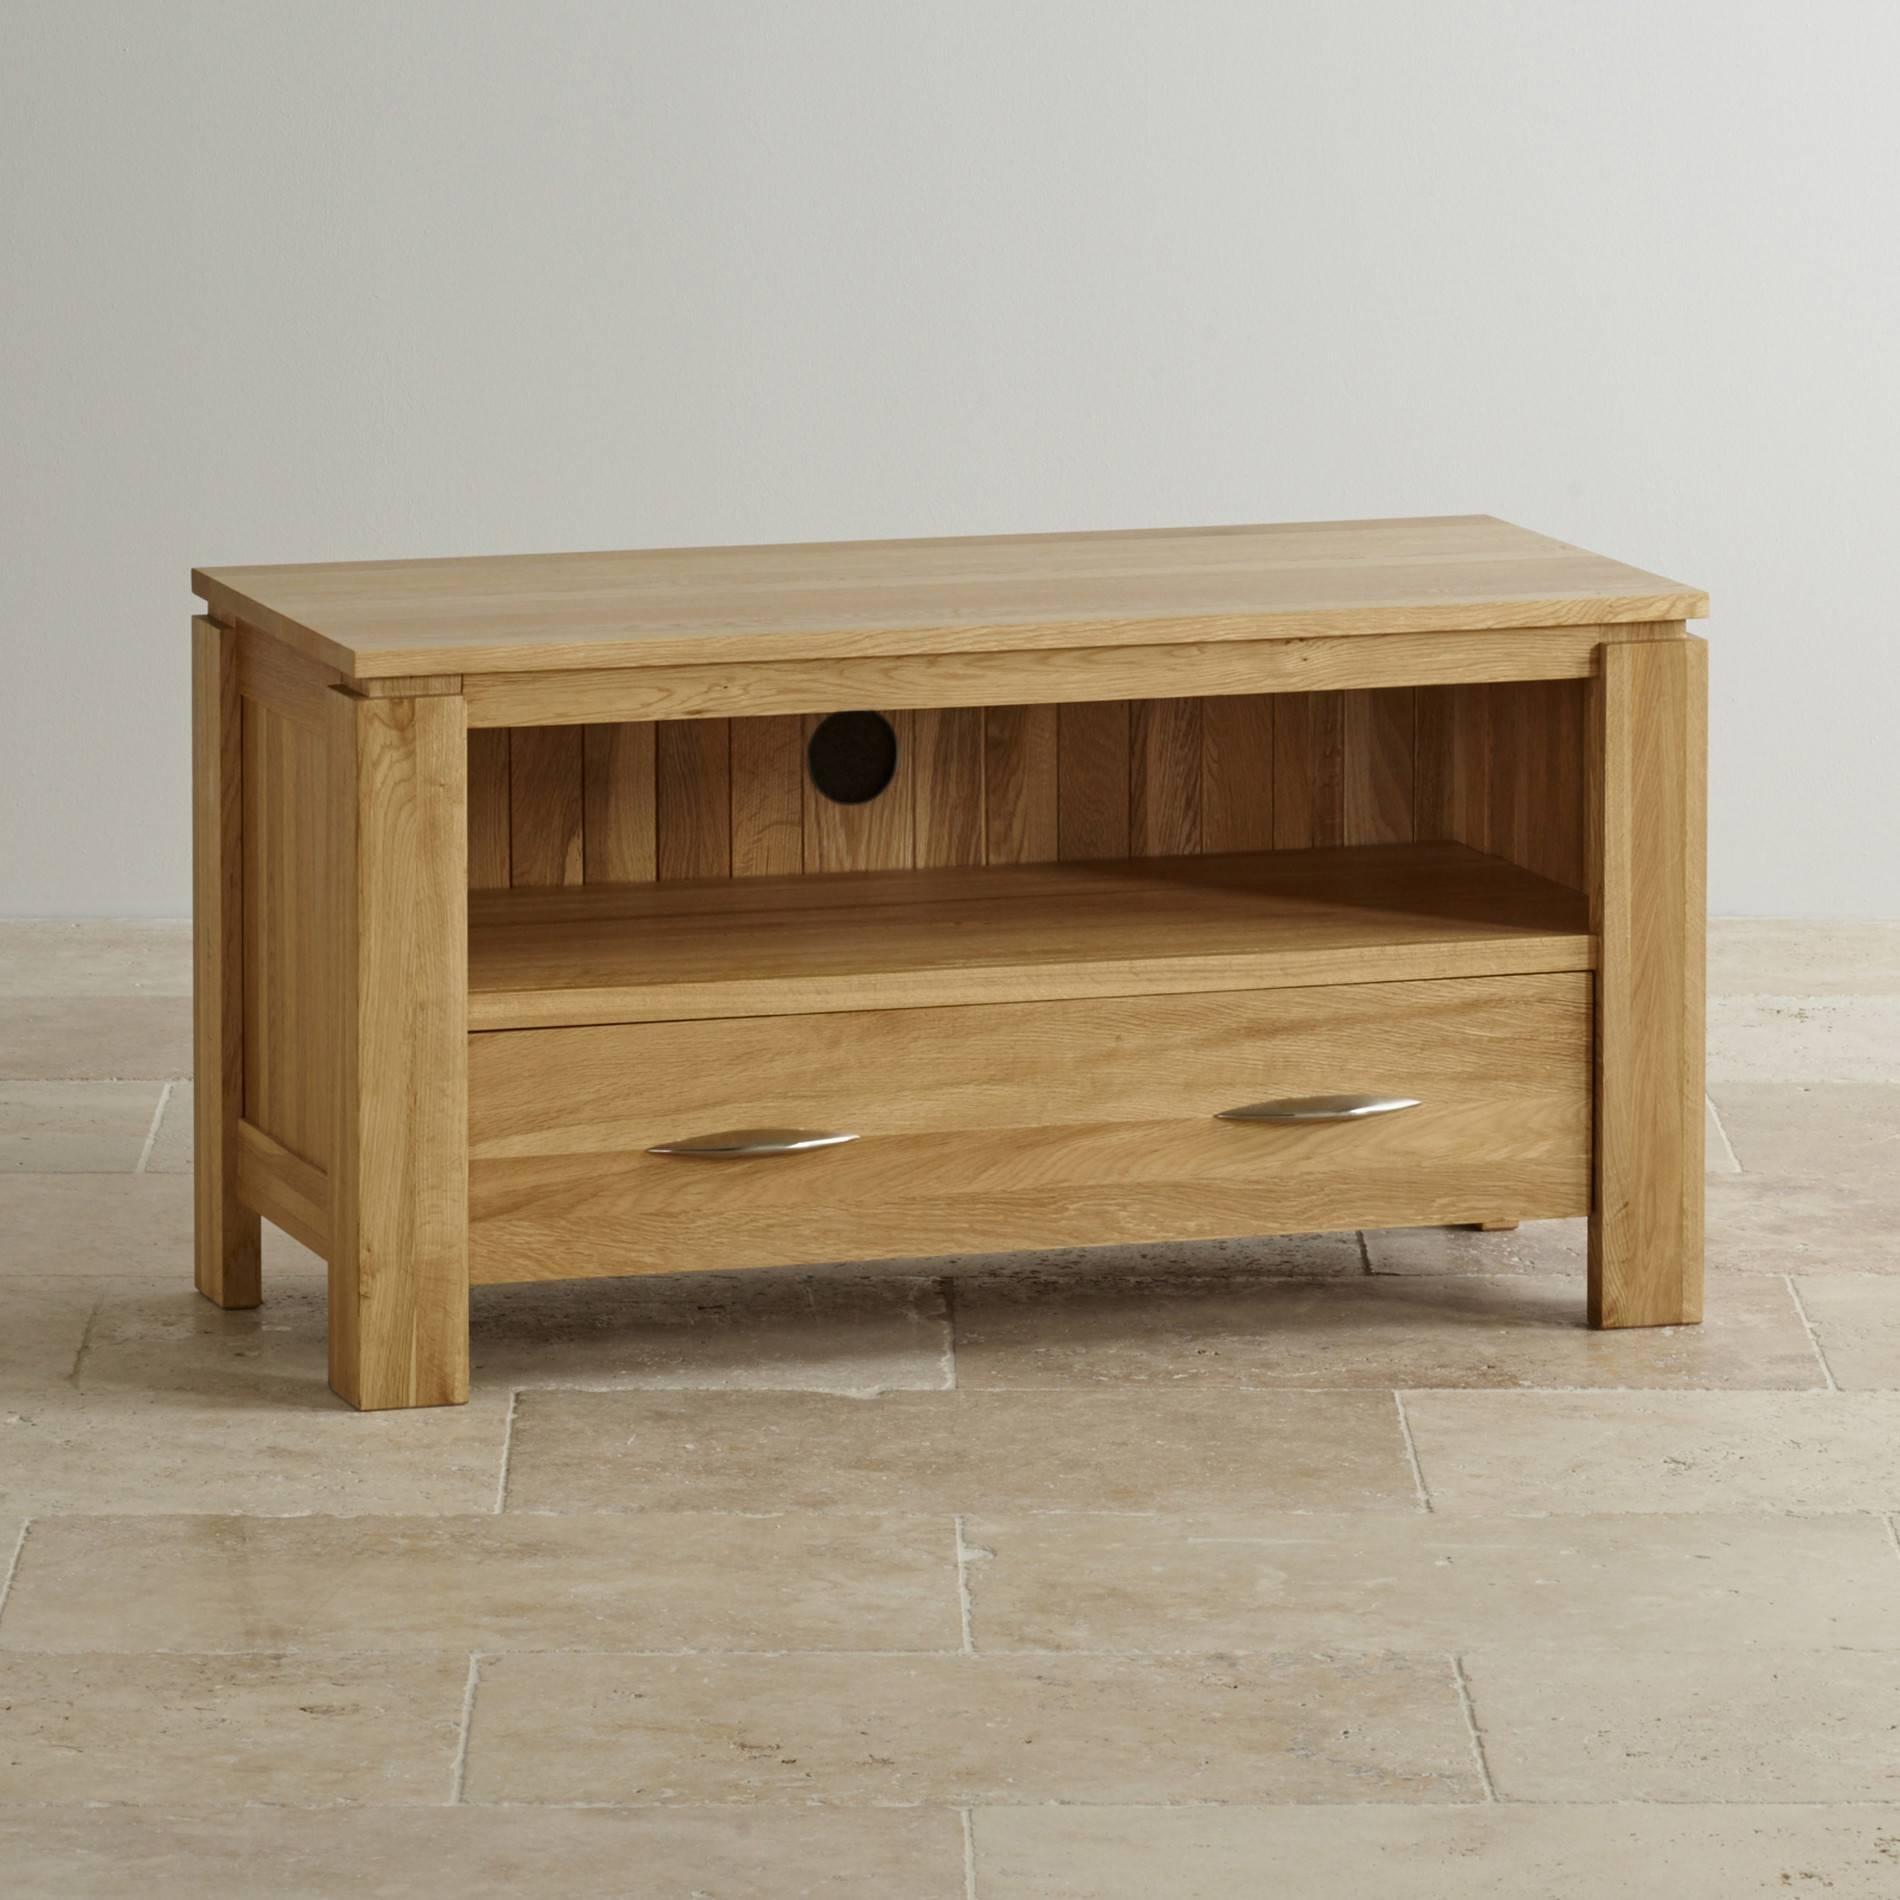 Galway Natural Solid Oak Tv + Dvd Stand | Living Room Furniture Inside Corner Oak Tv Stands (View 2 of 15)